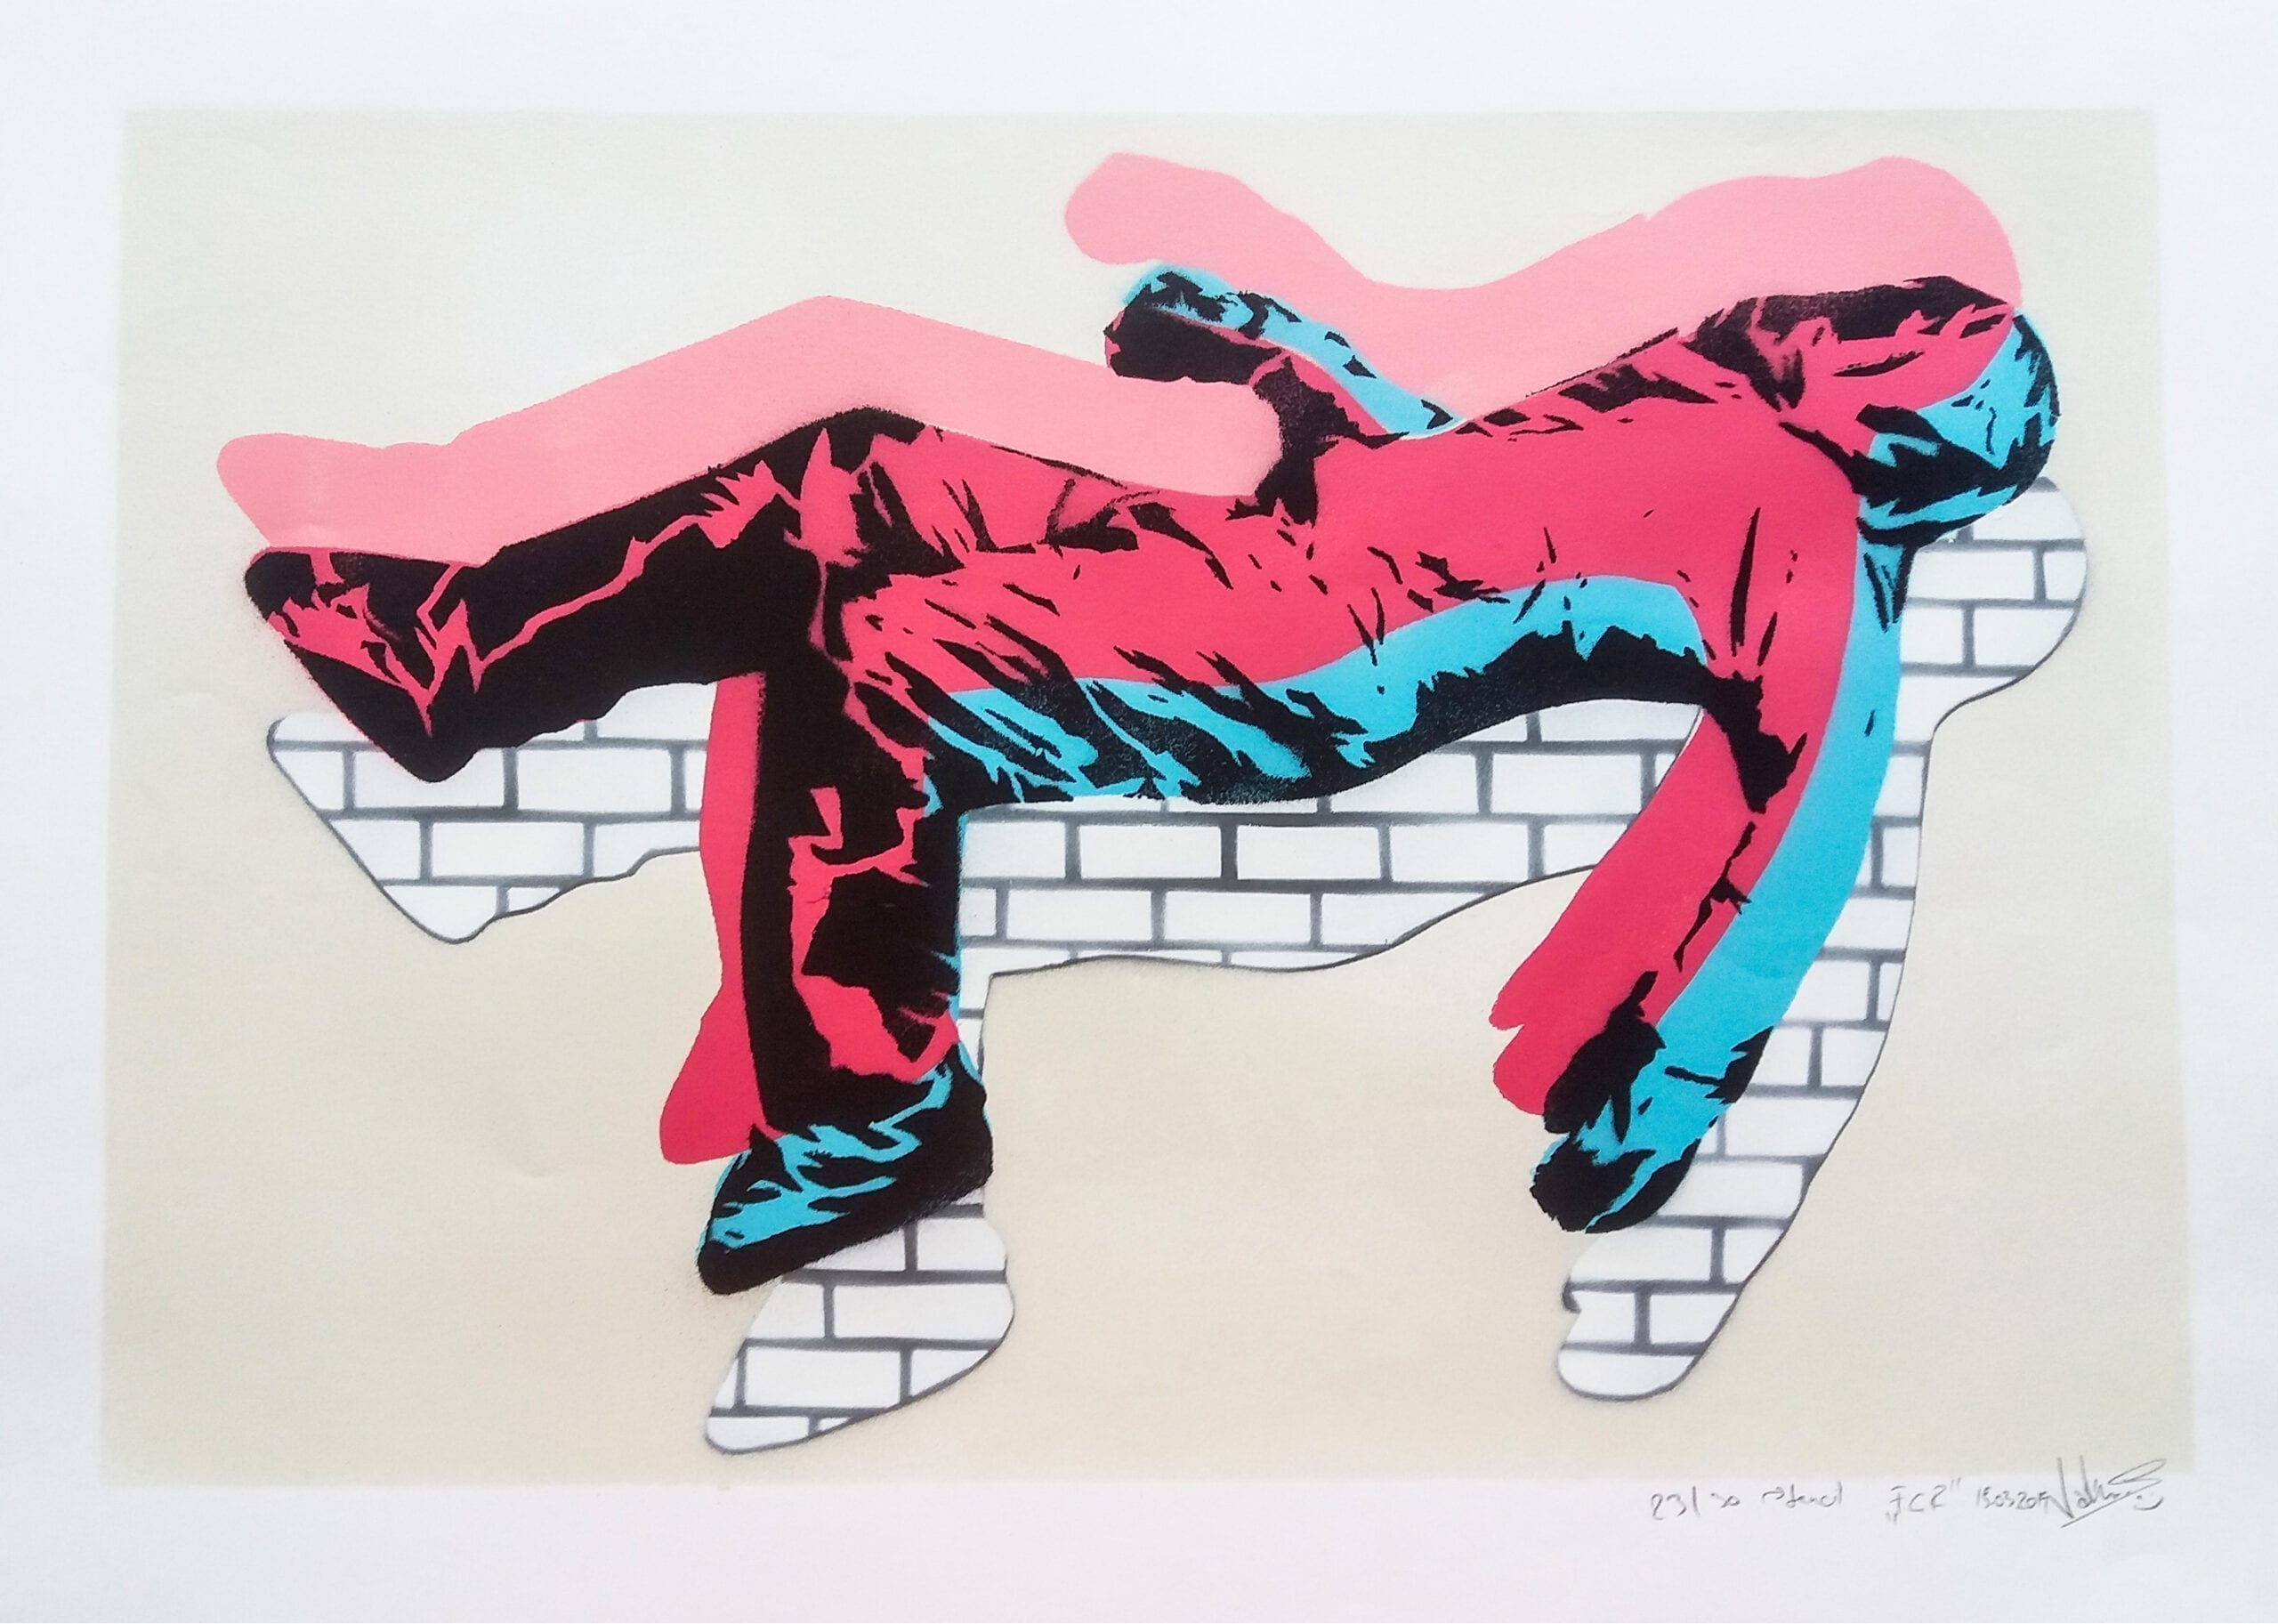 John Dot S reab-echi-ili-bru-tare-limited edition of 30(22buc)-35x50cm-spray on paper